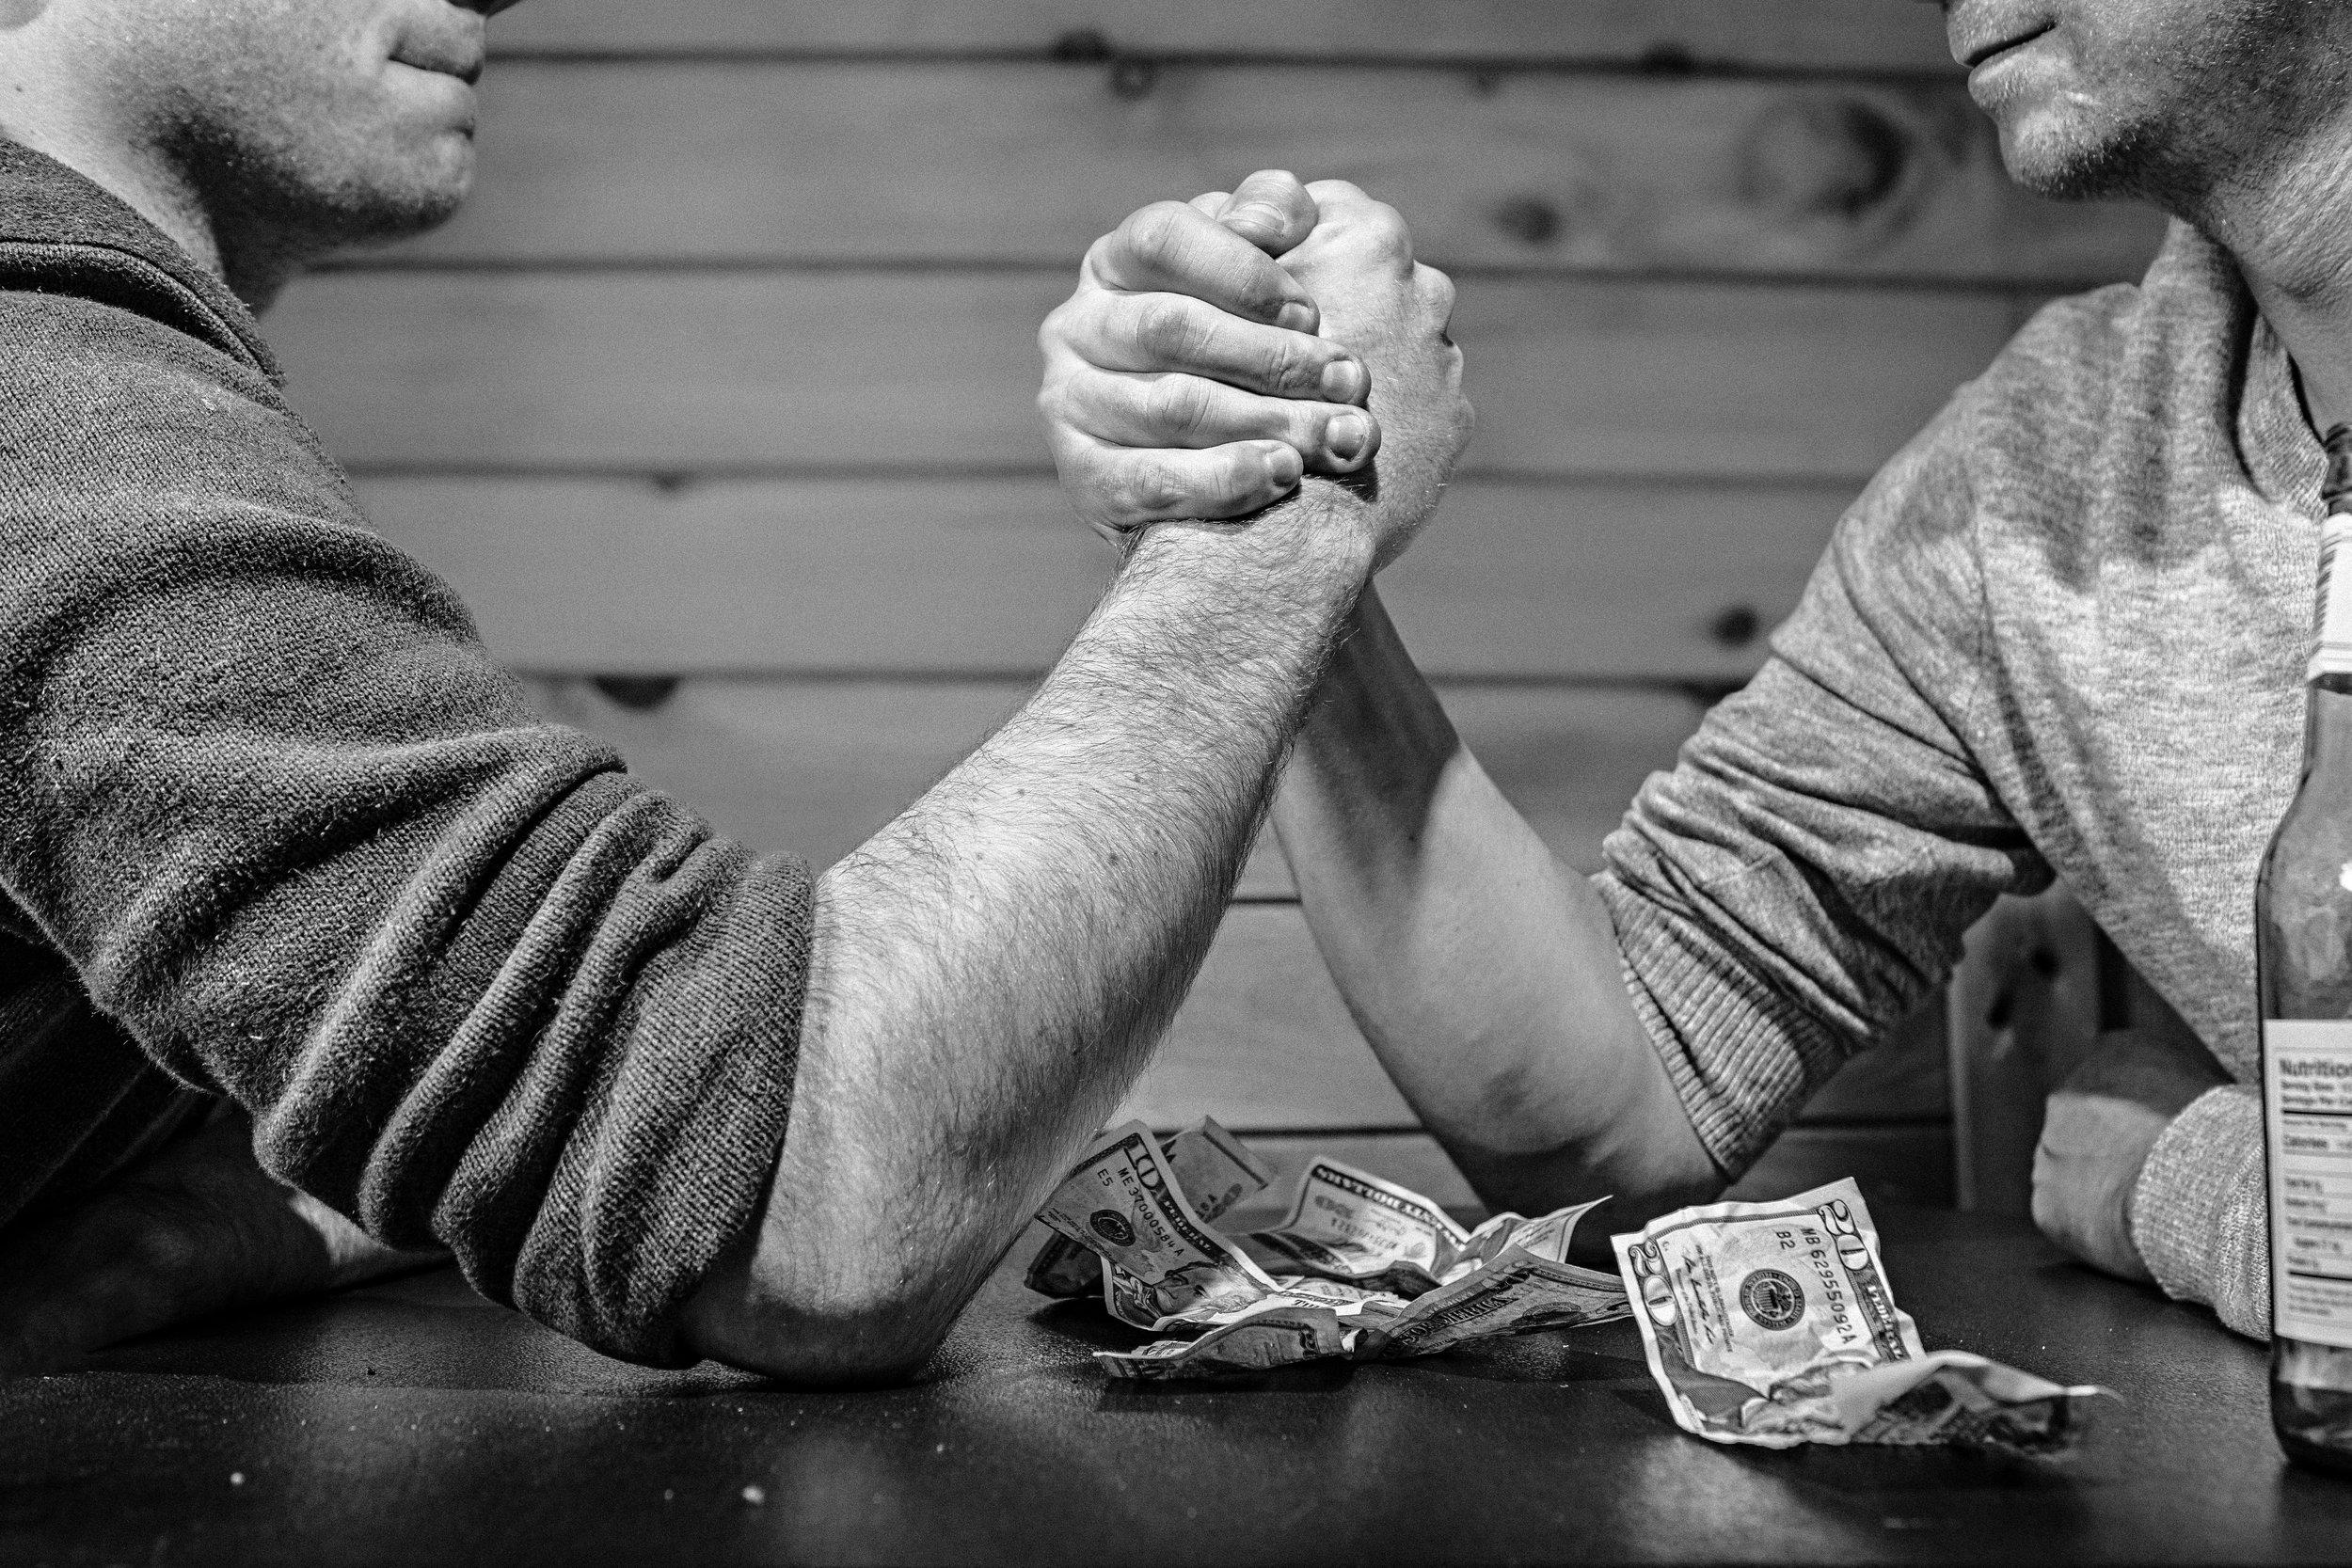 arm-wrestling-bar-bet-4417.jpg